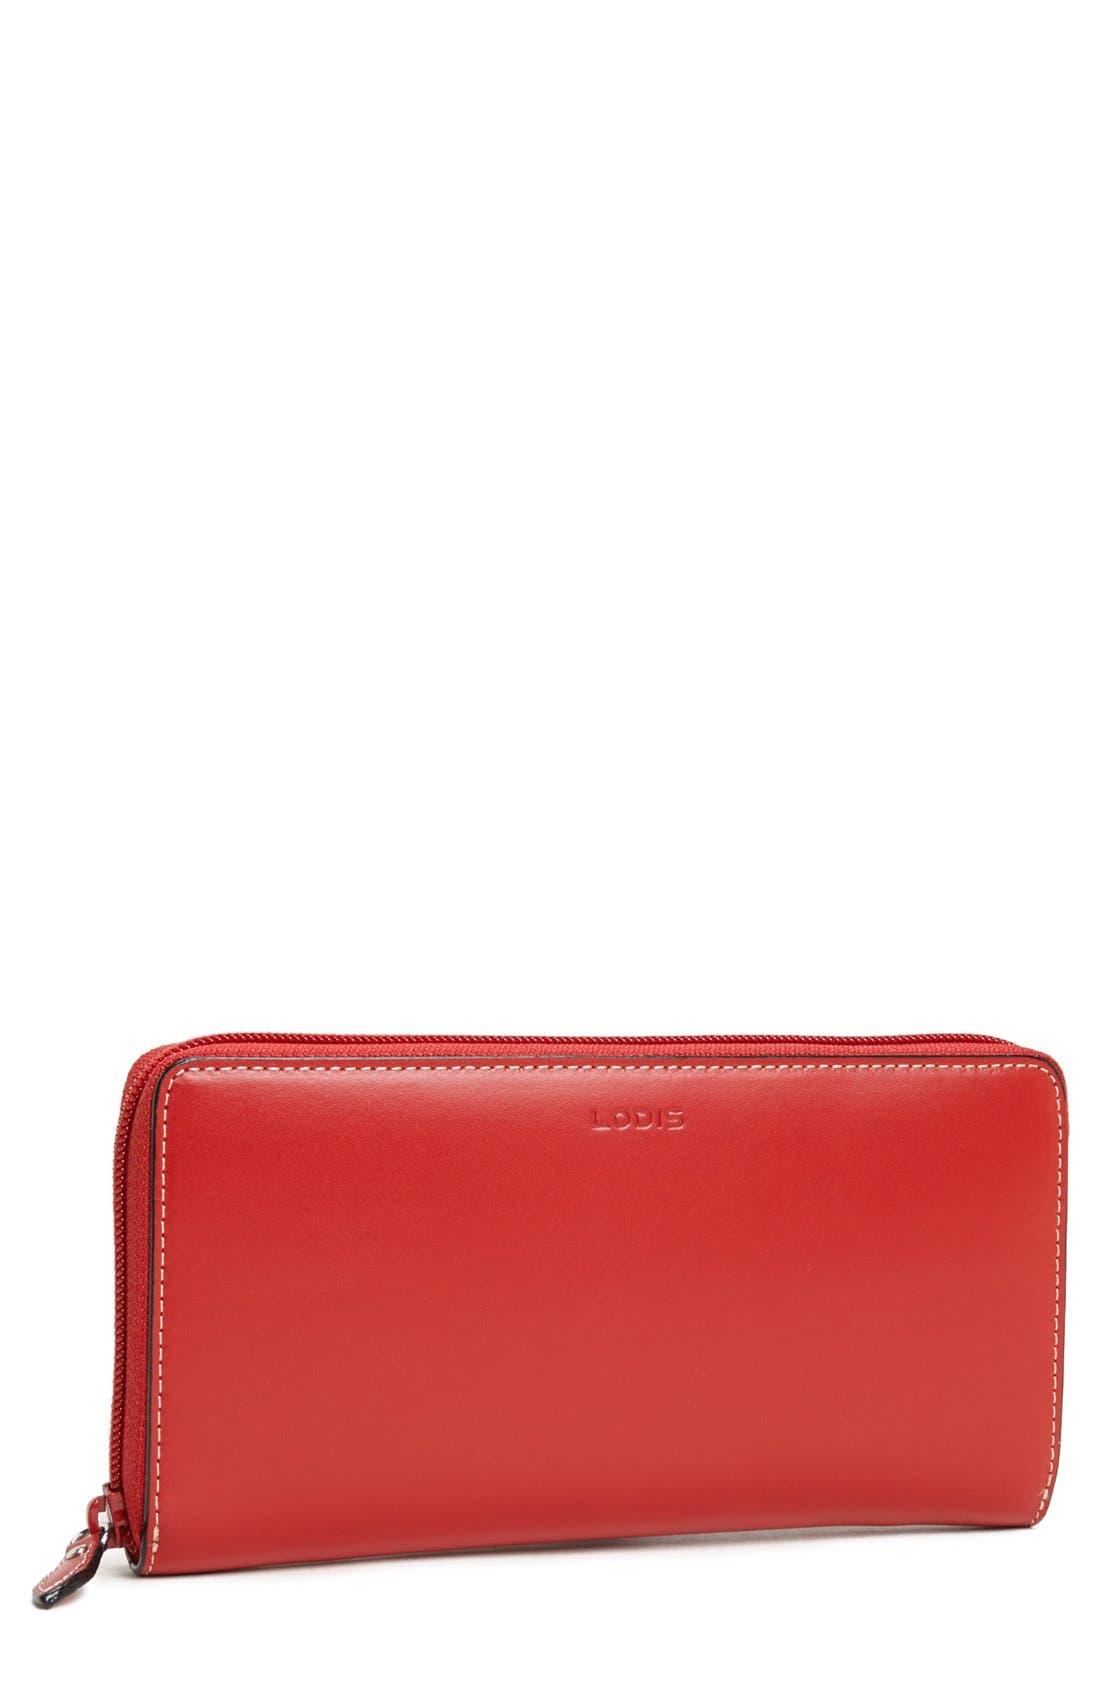 Main Image - Lodis 'Audrey Collection - Iris' Zip Around Wallet